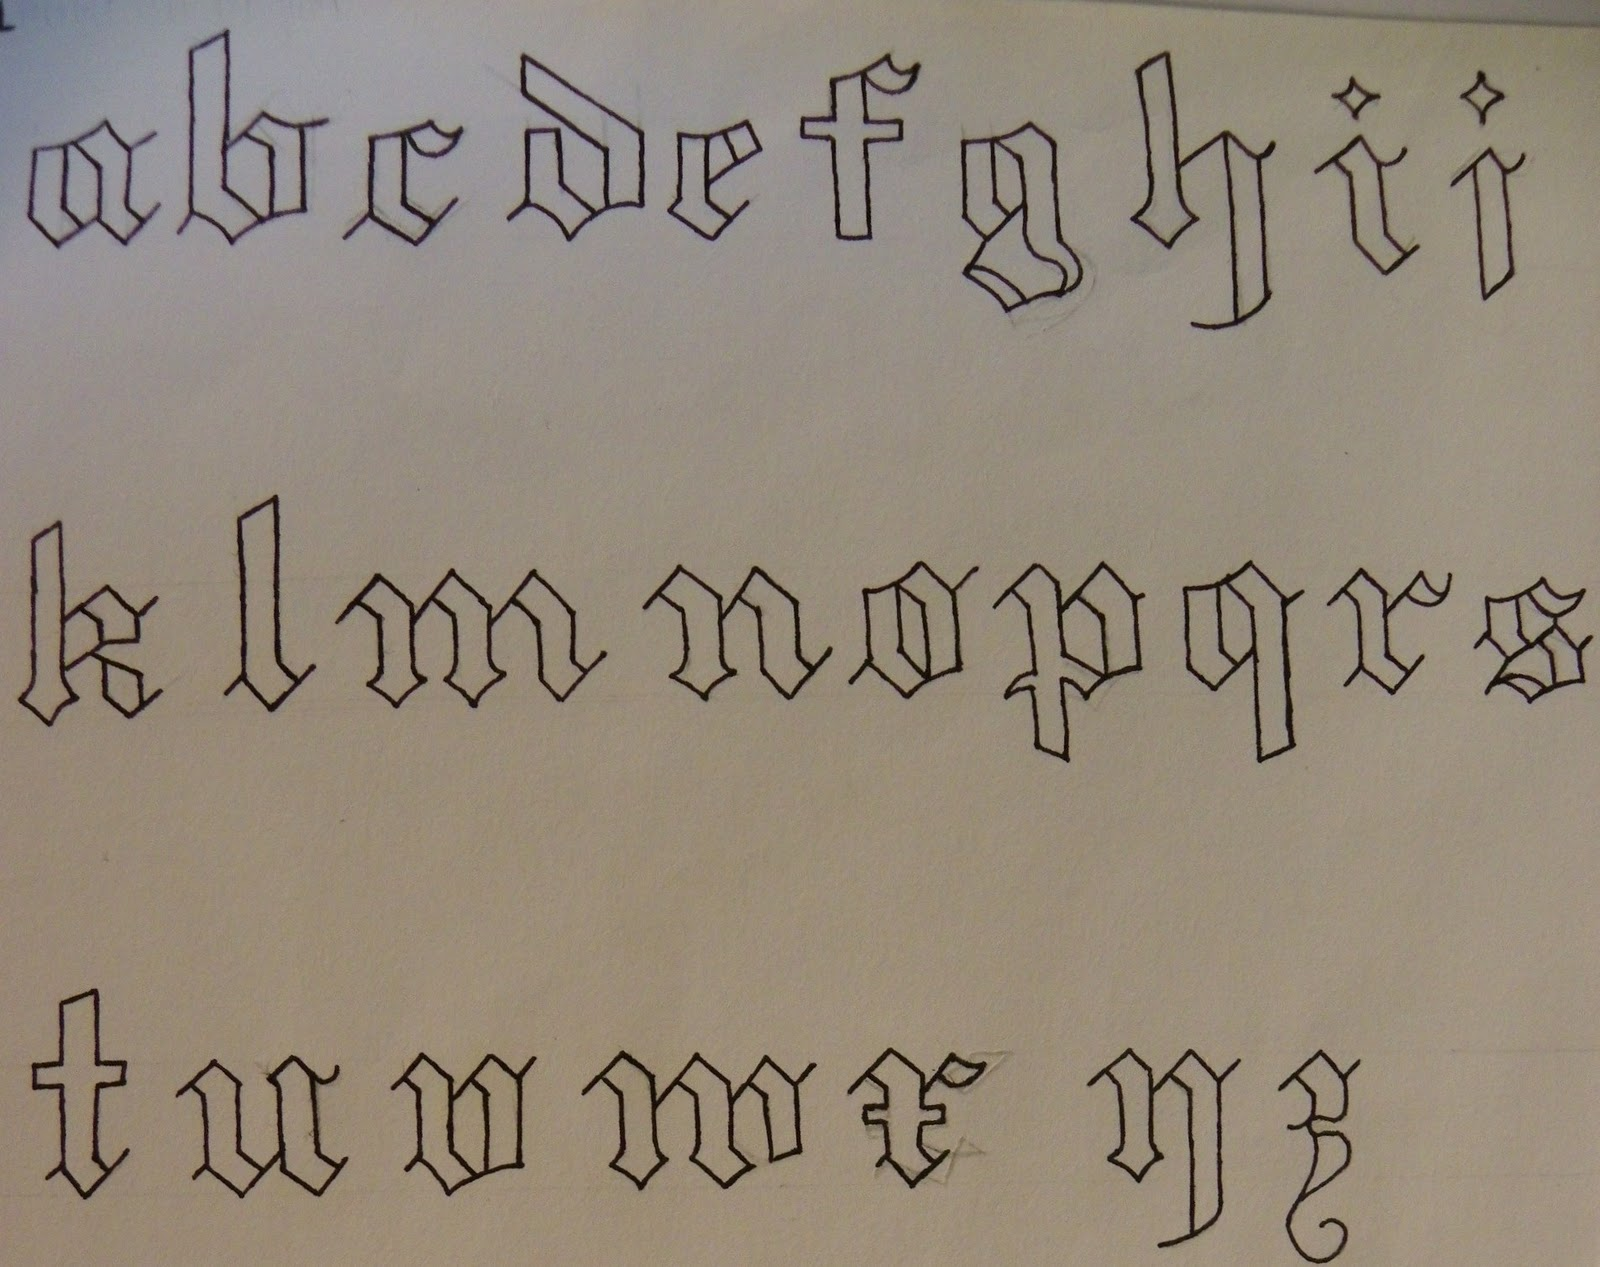 ecriture tatouage tibetain - Modèles de tatouages tibétains tibetan calligraphy